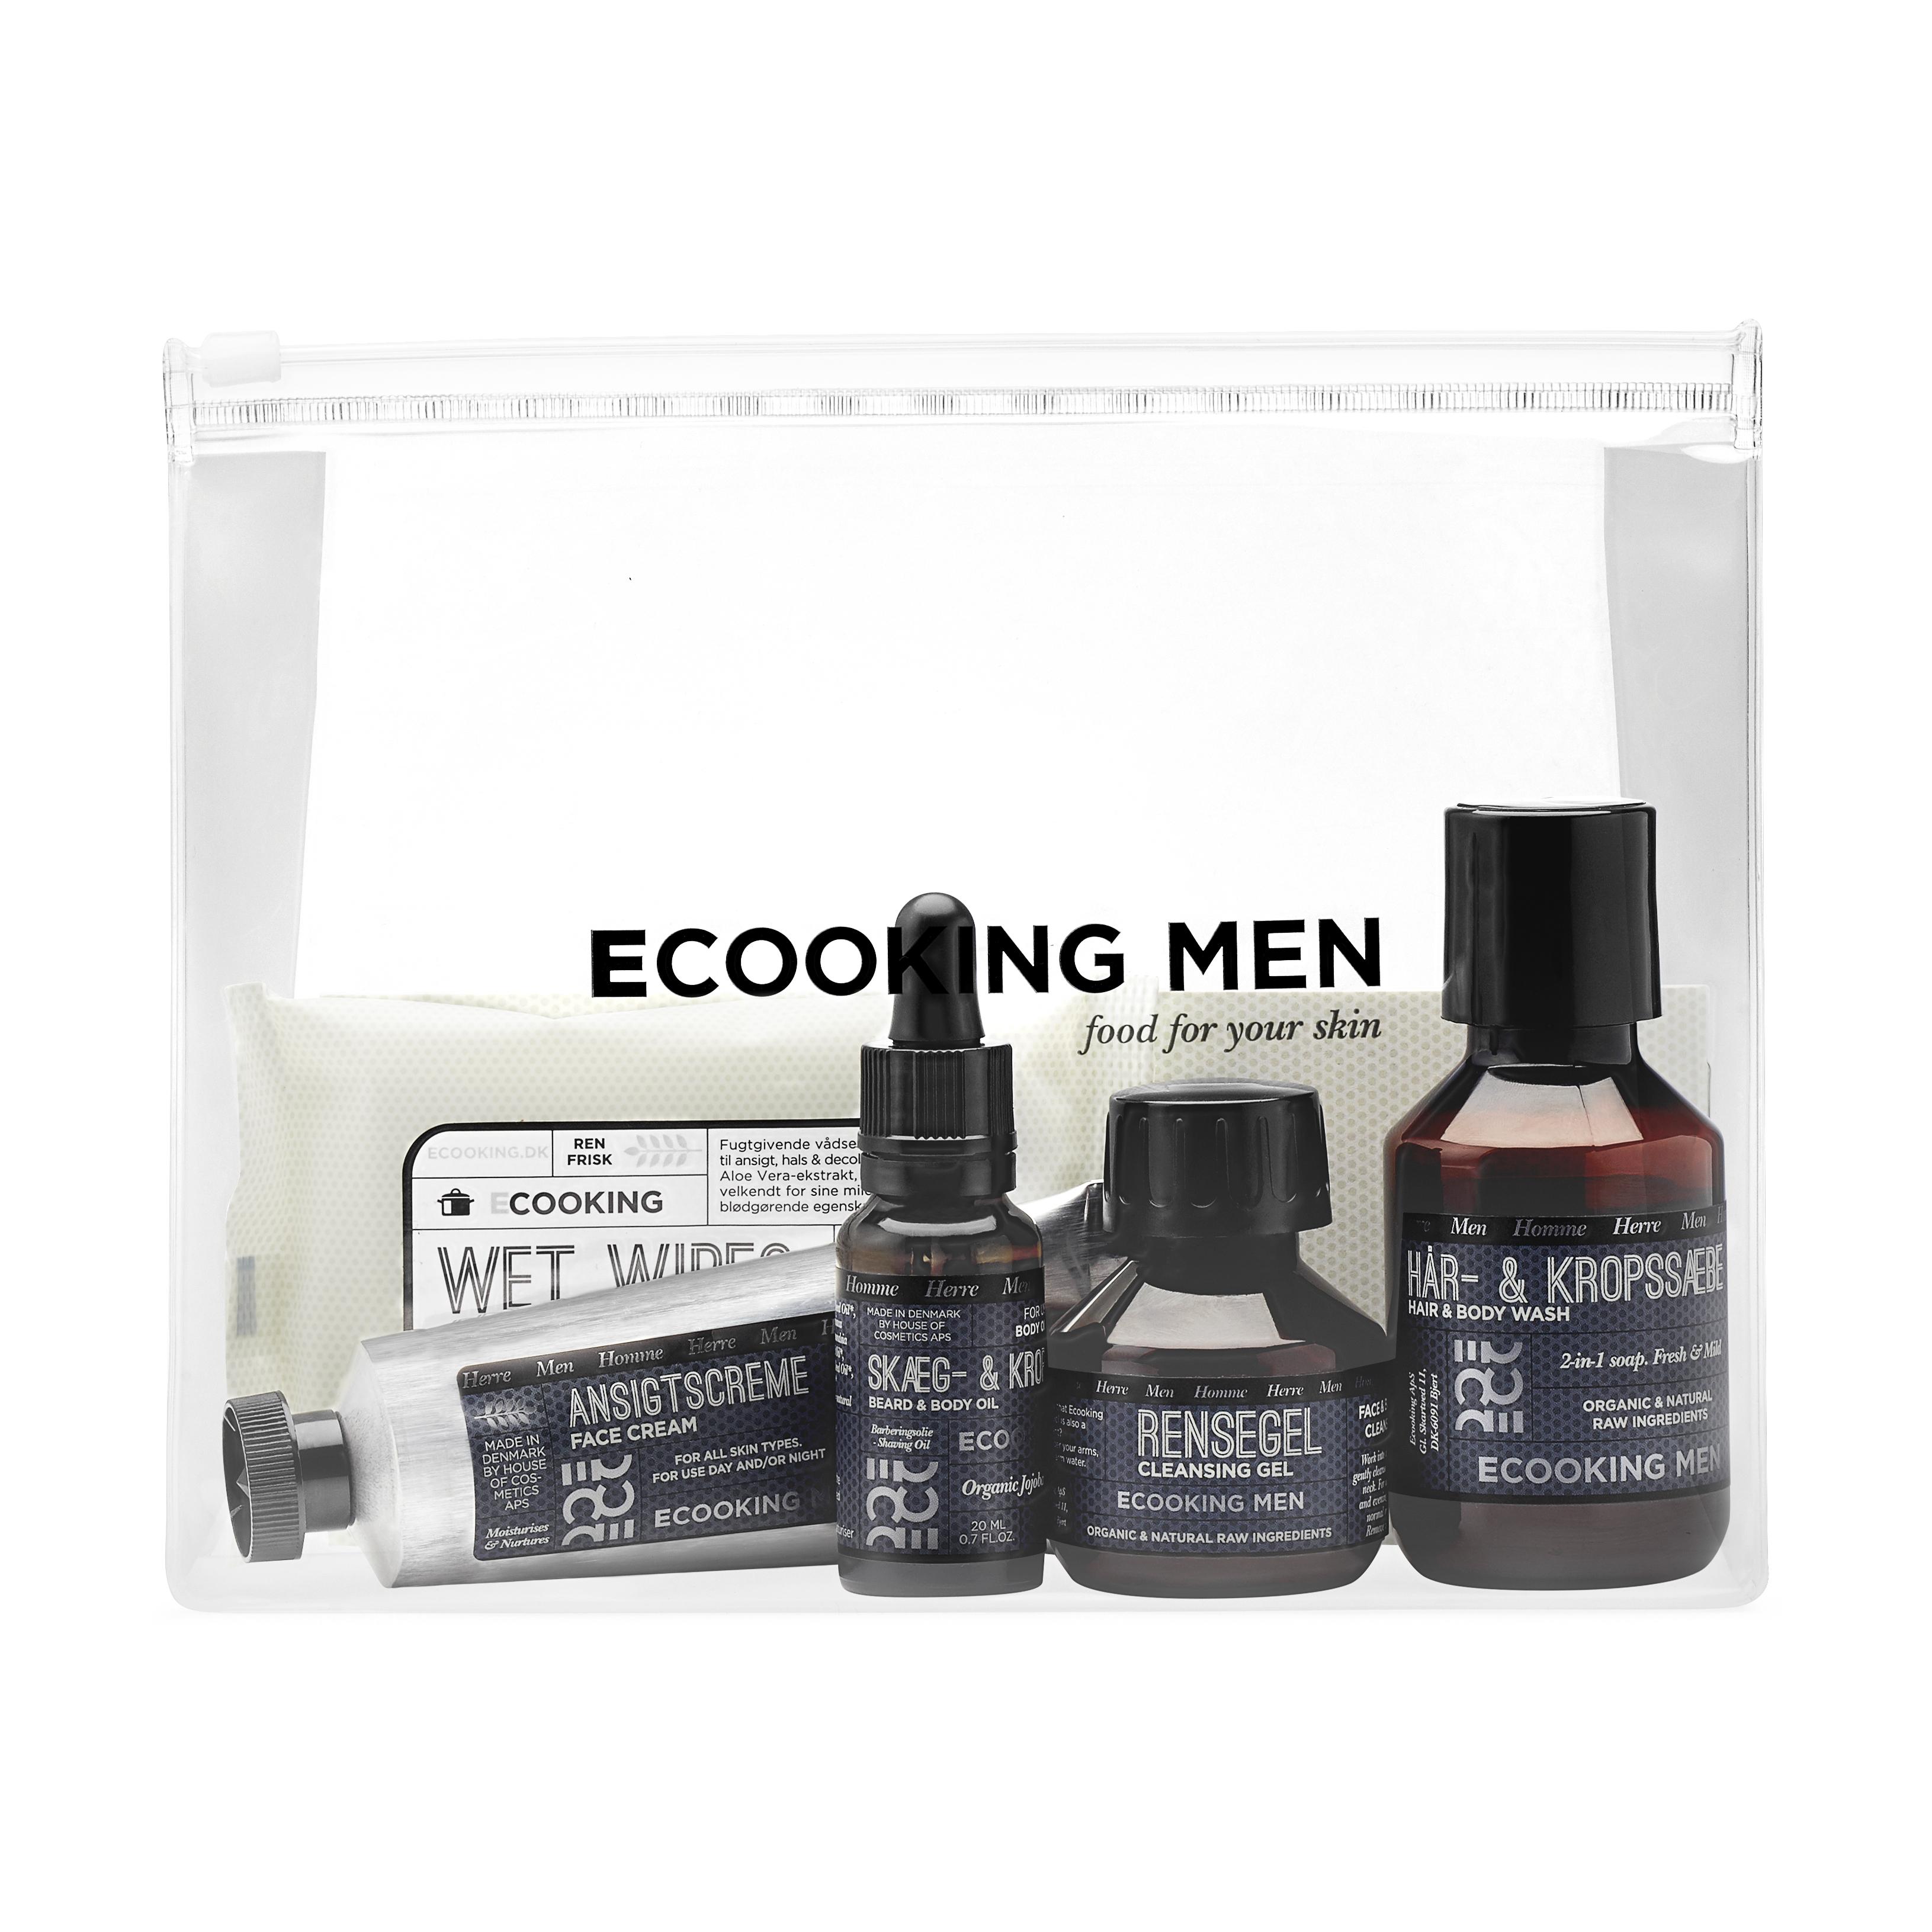 Ecooking Men Startersæt